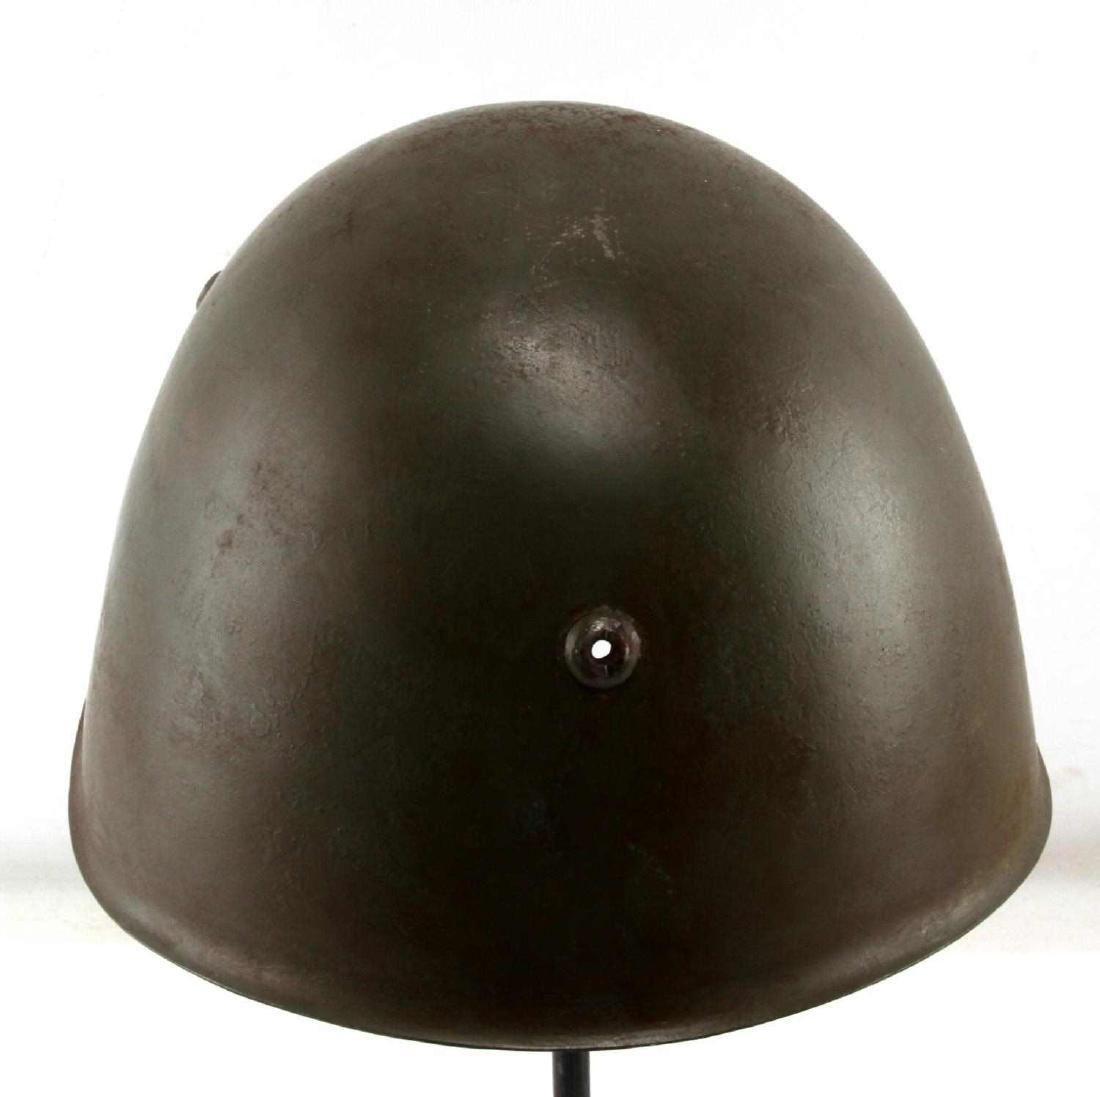 GERMAN ITALIAN WWII WAFFEN SS COMBAT HELMET - 3